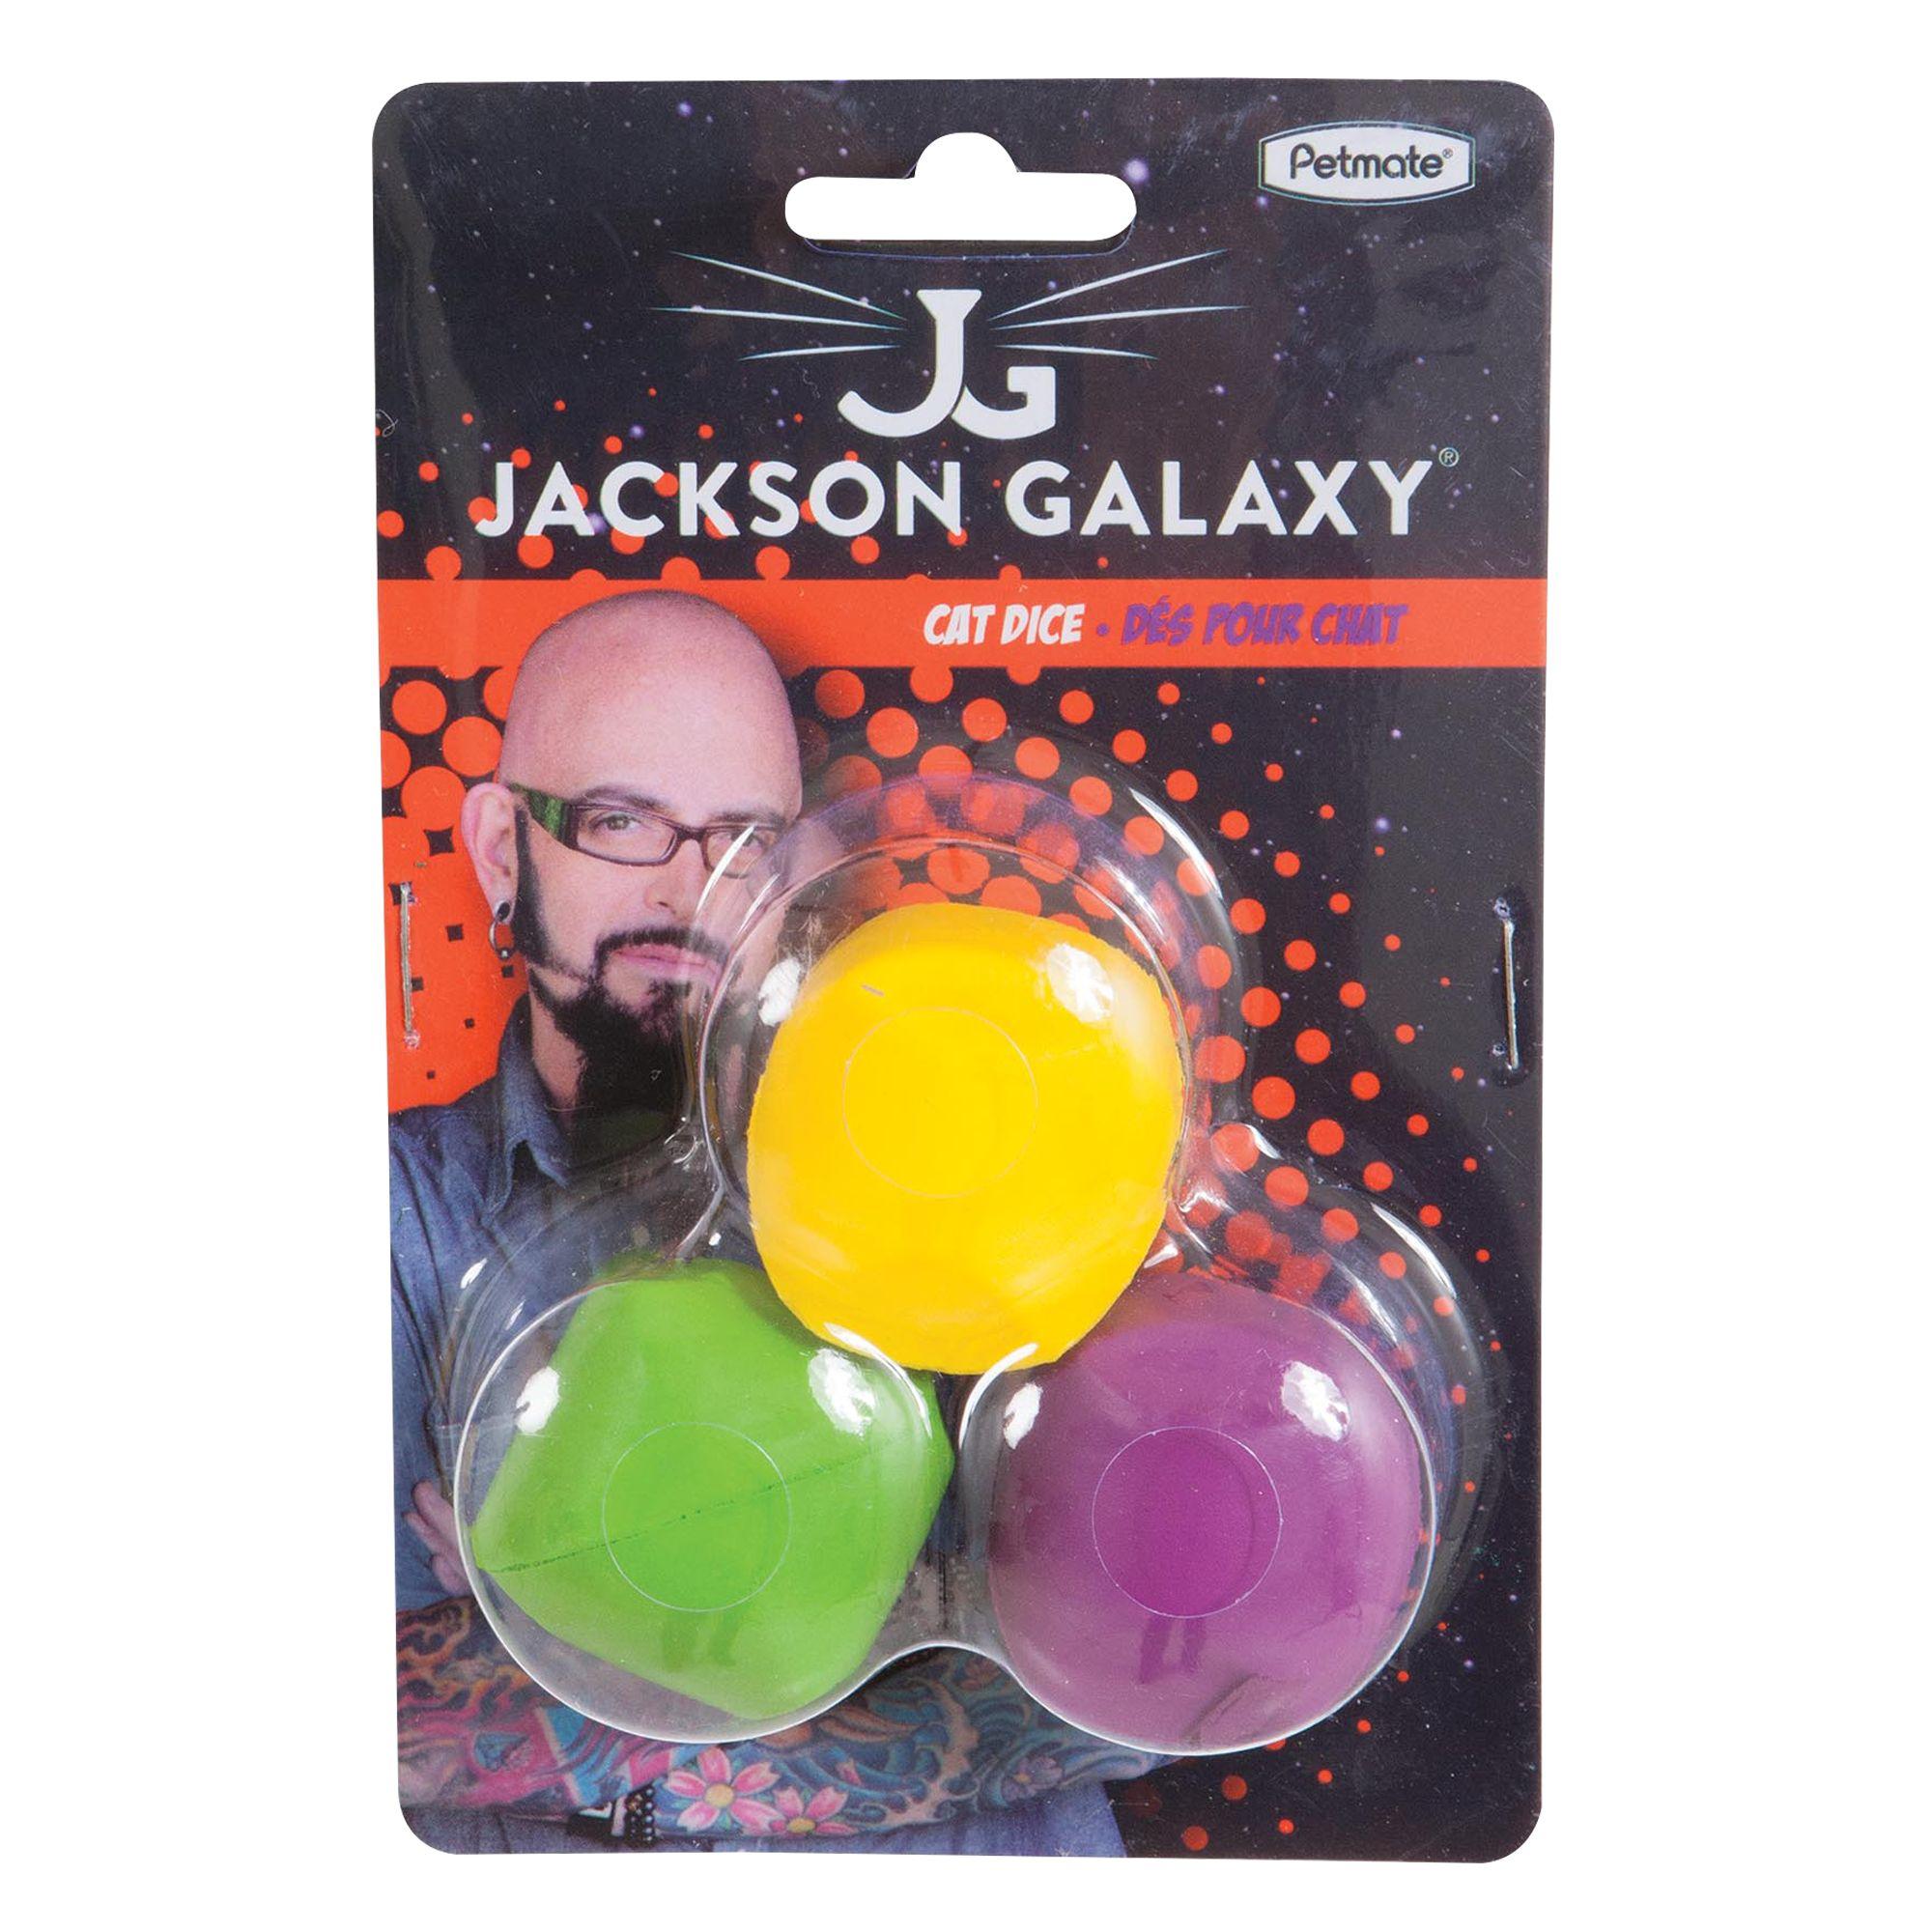 Jackson Galaxy Dice Cat Toy